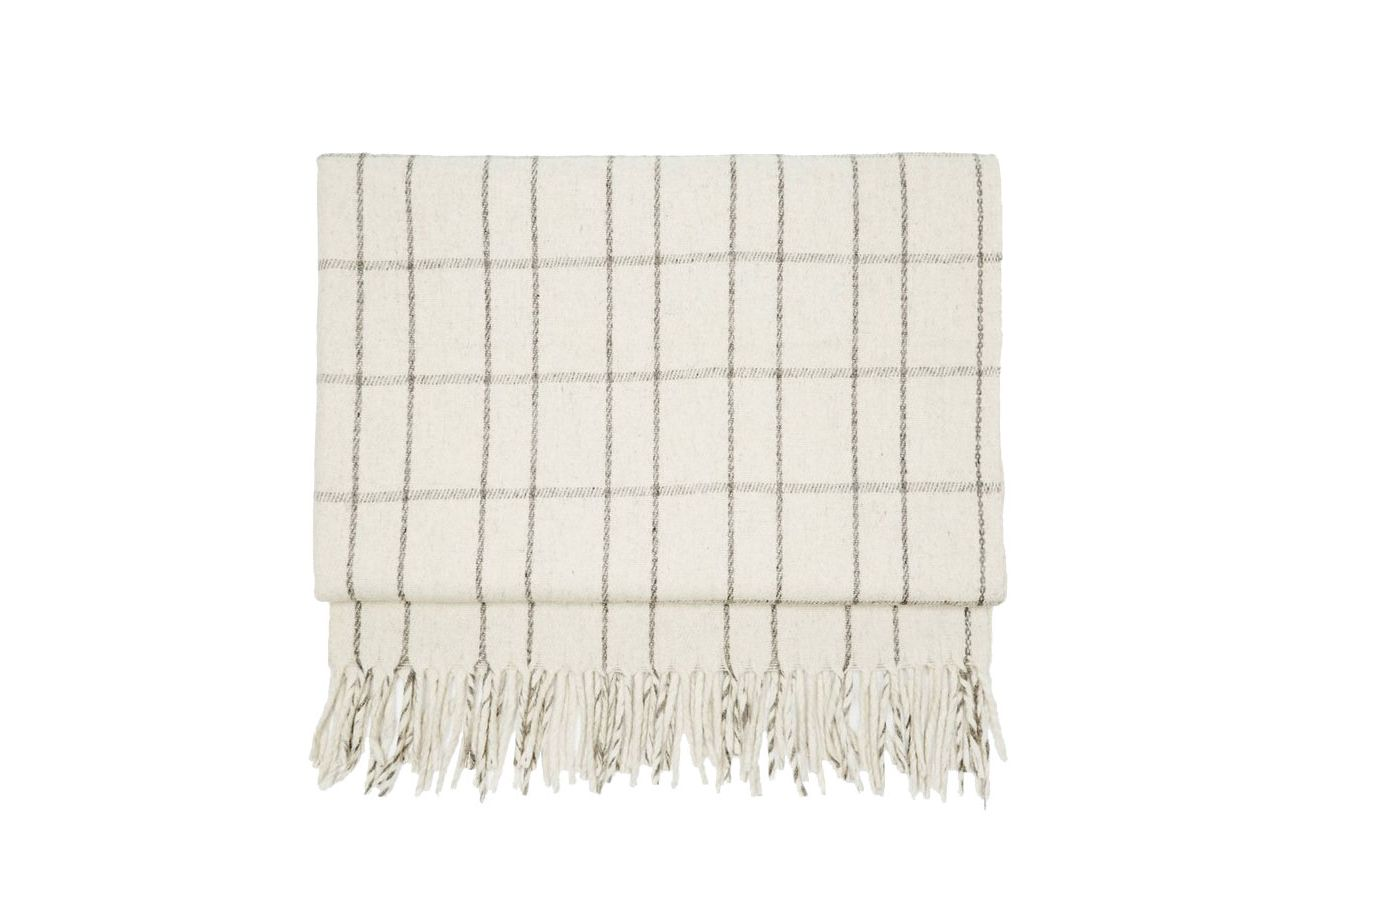 Mexchic Wool Blanket